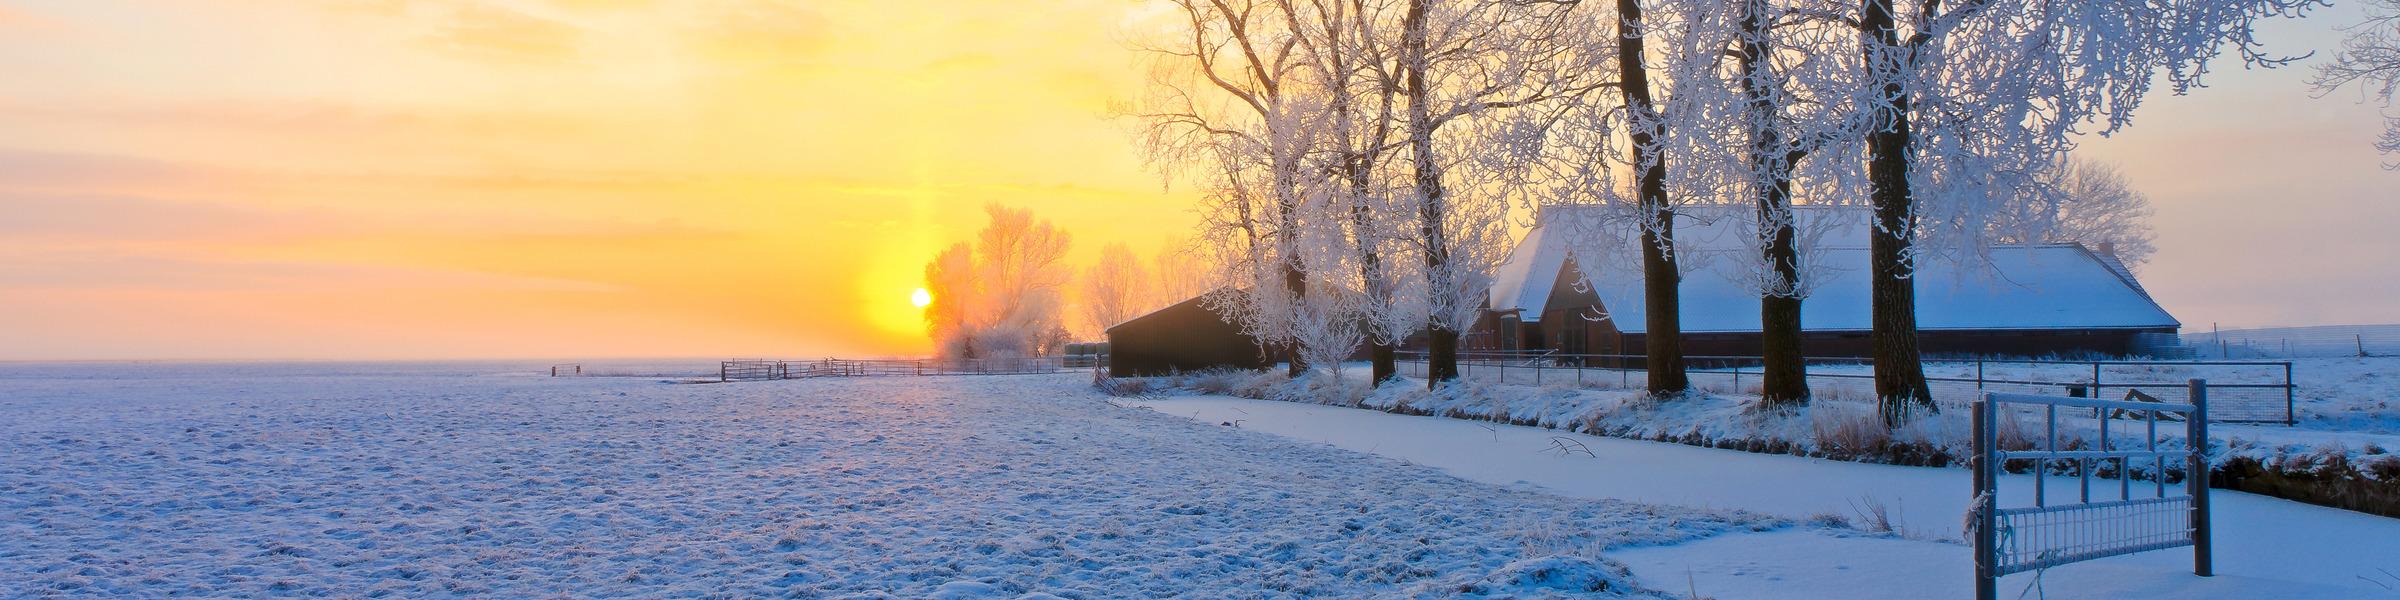 Winter_farm